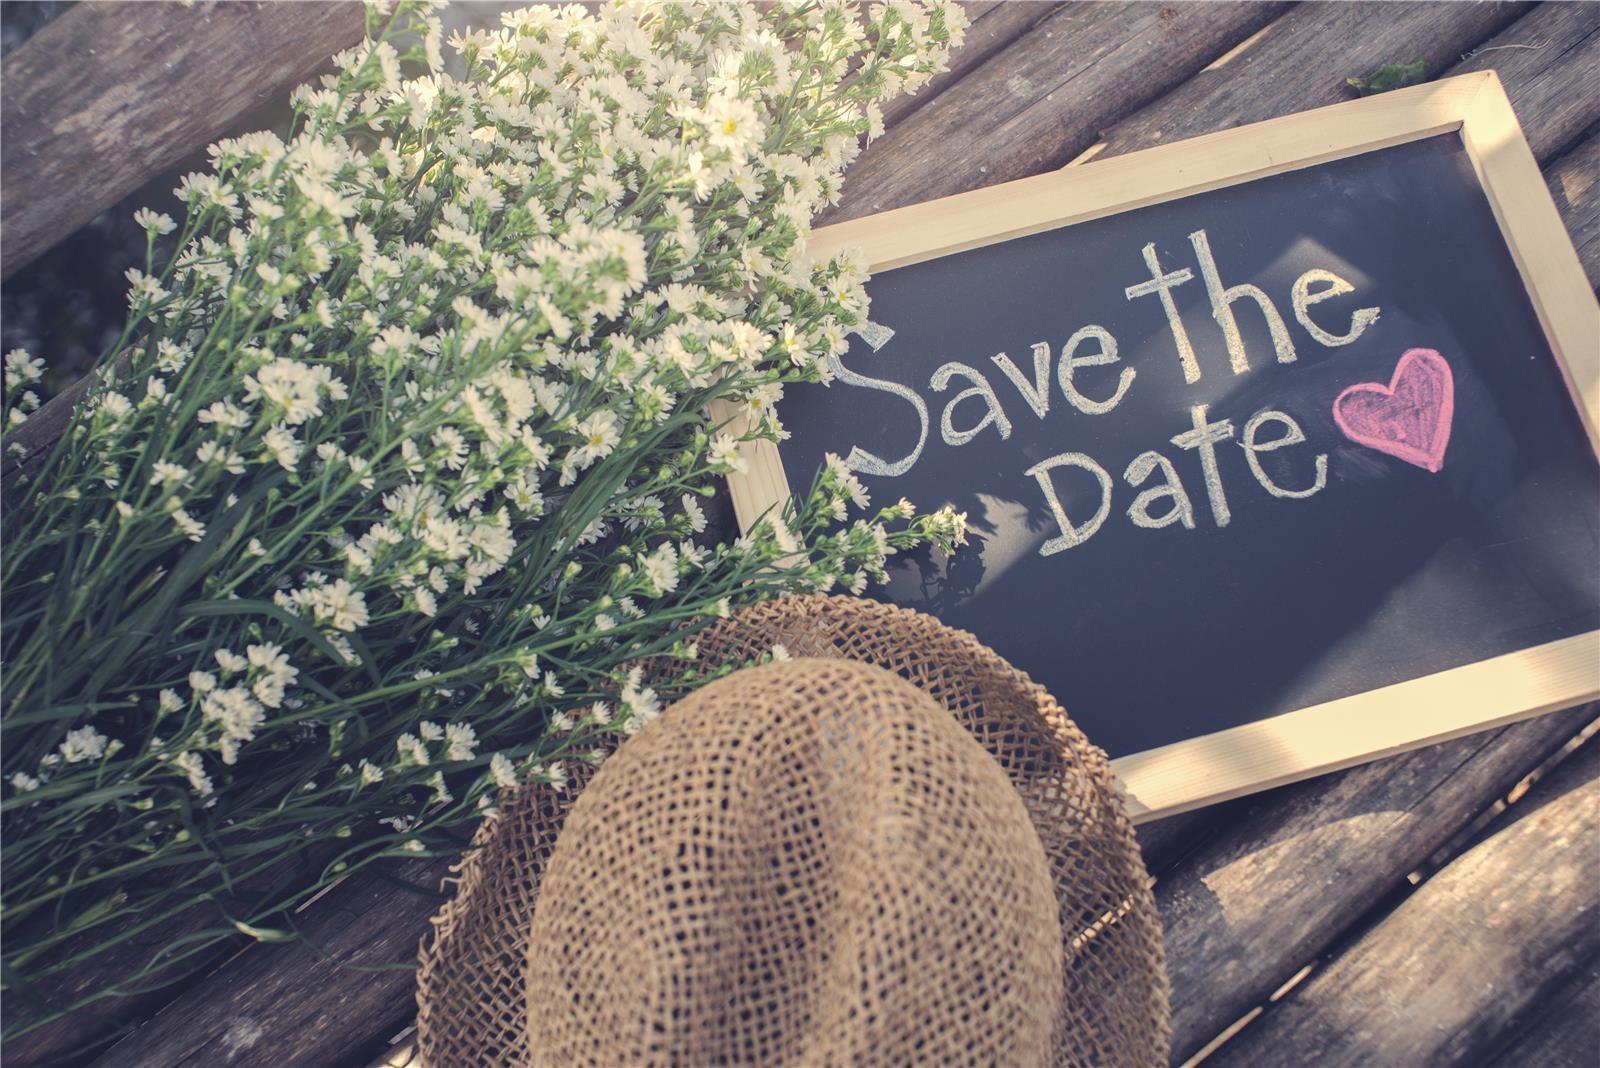 שלט save the date (צילום: Shutterstock)